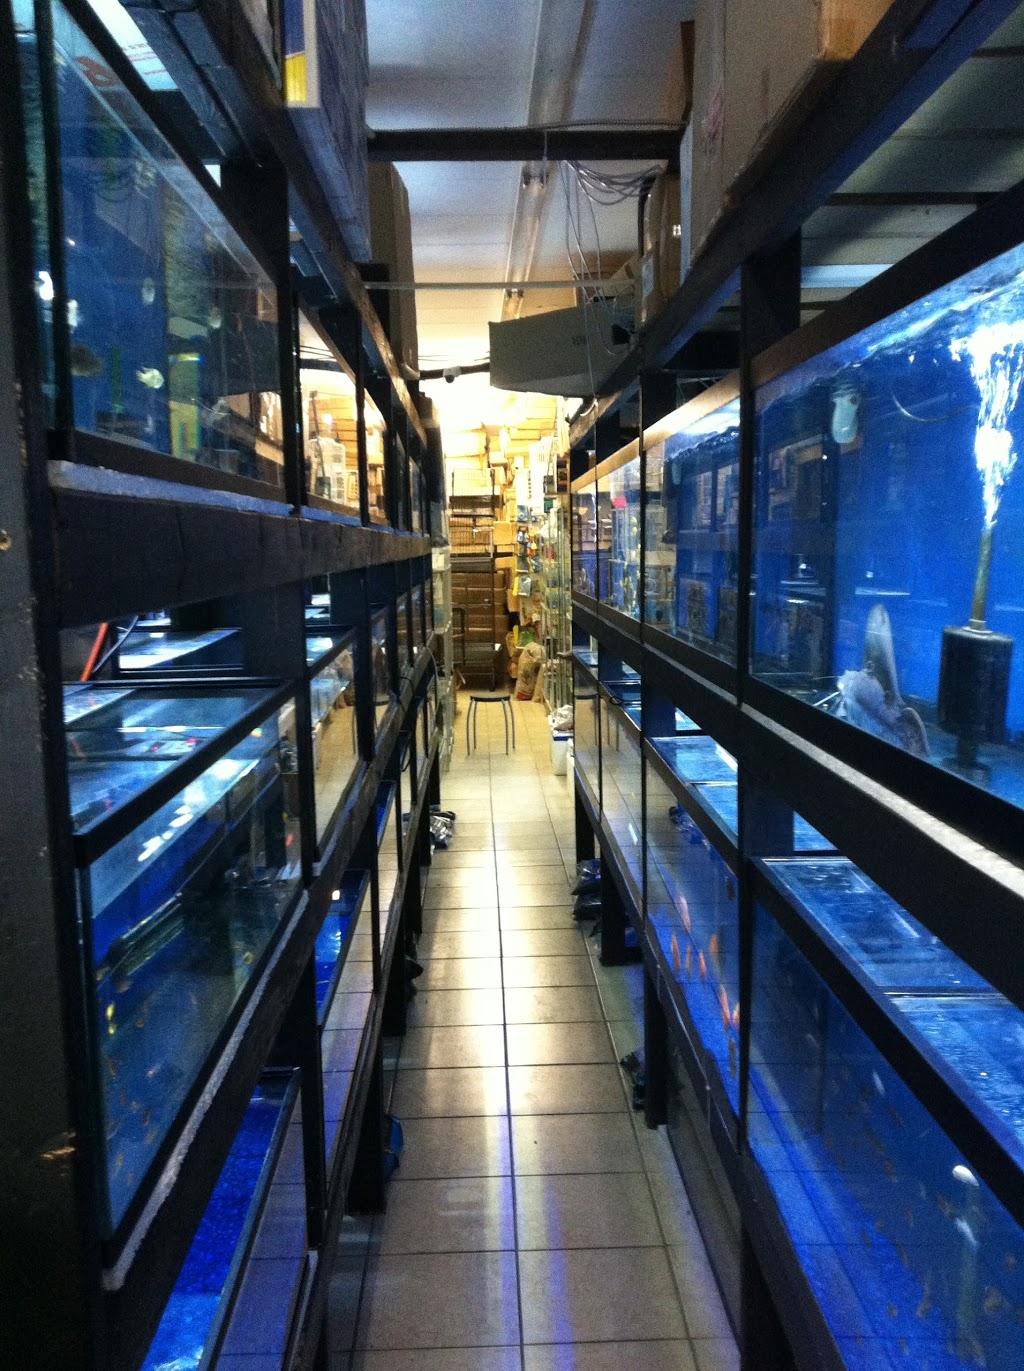 T T Aquarium Pets 1160 Albion Rd Etobicoke On M9v 1a8 Canada